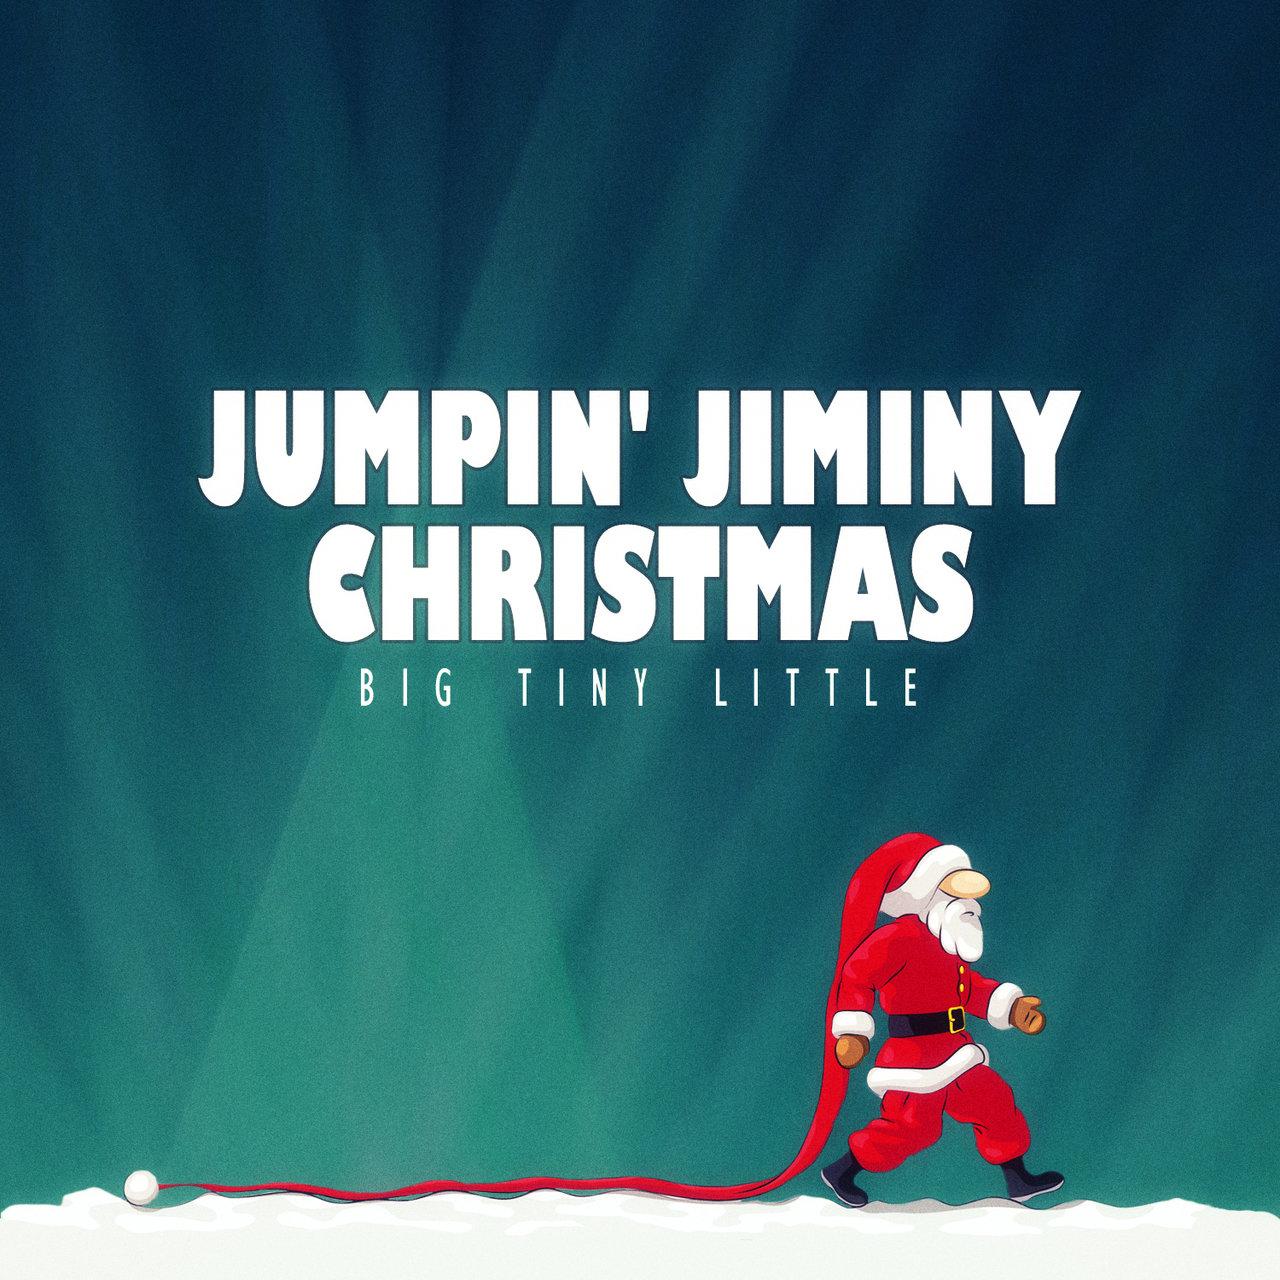 TIDAL: Listen to Jumpin\' Jiminy Christmas on TIDAL